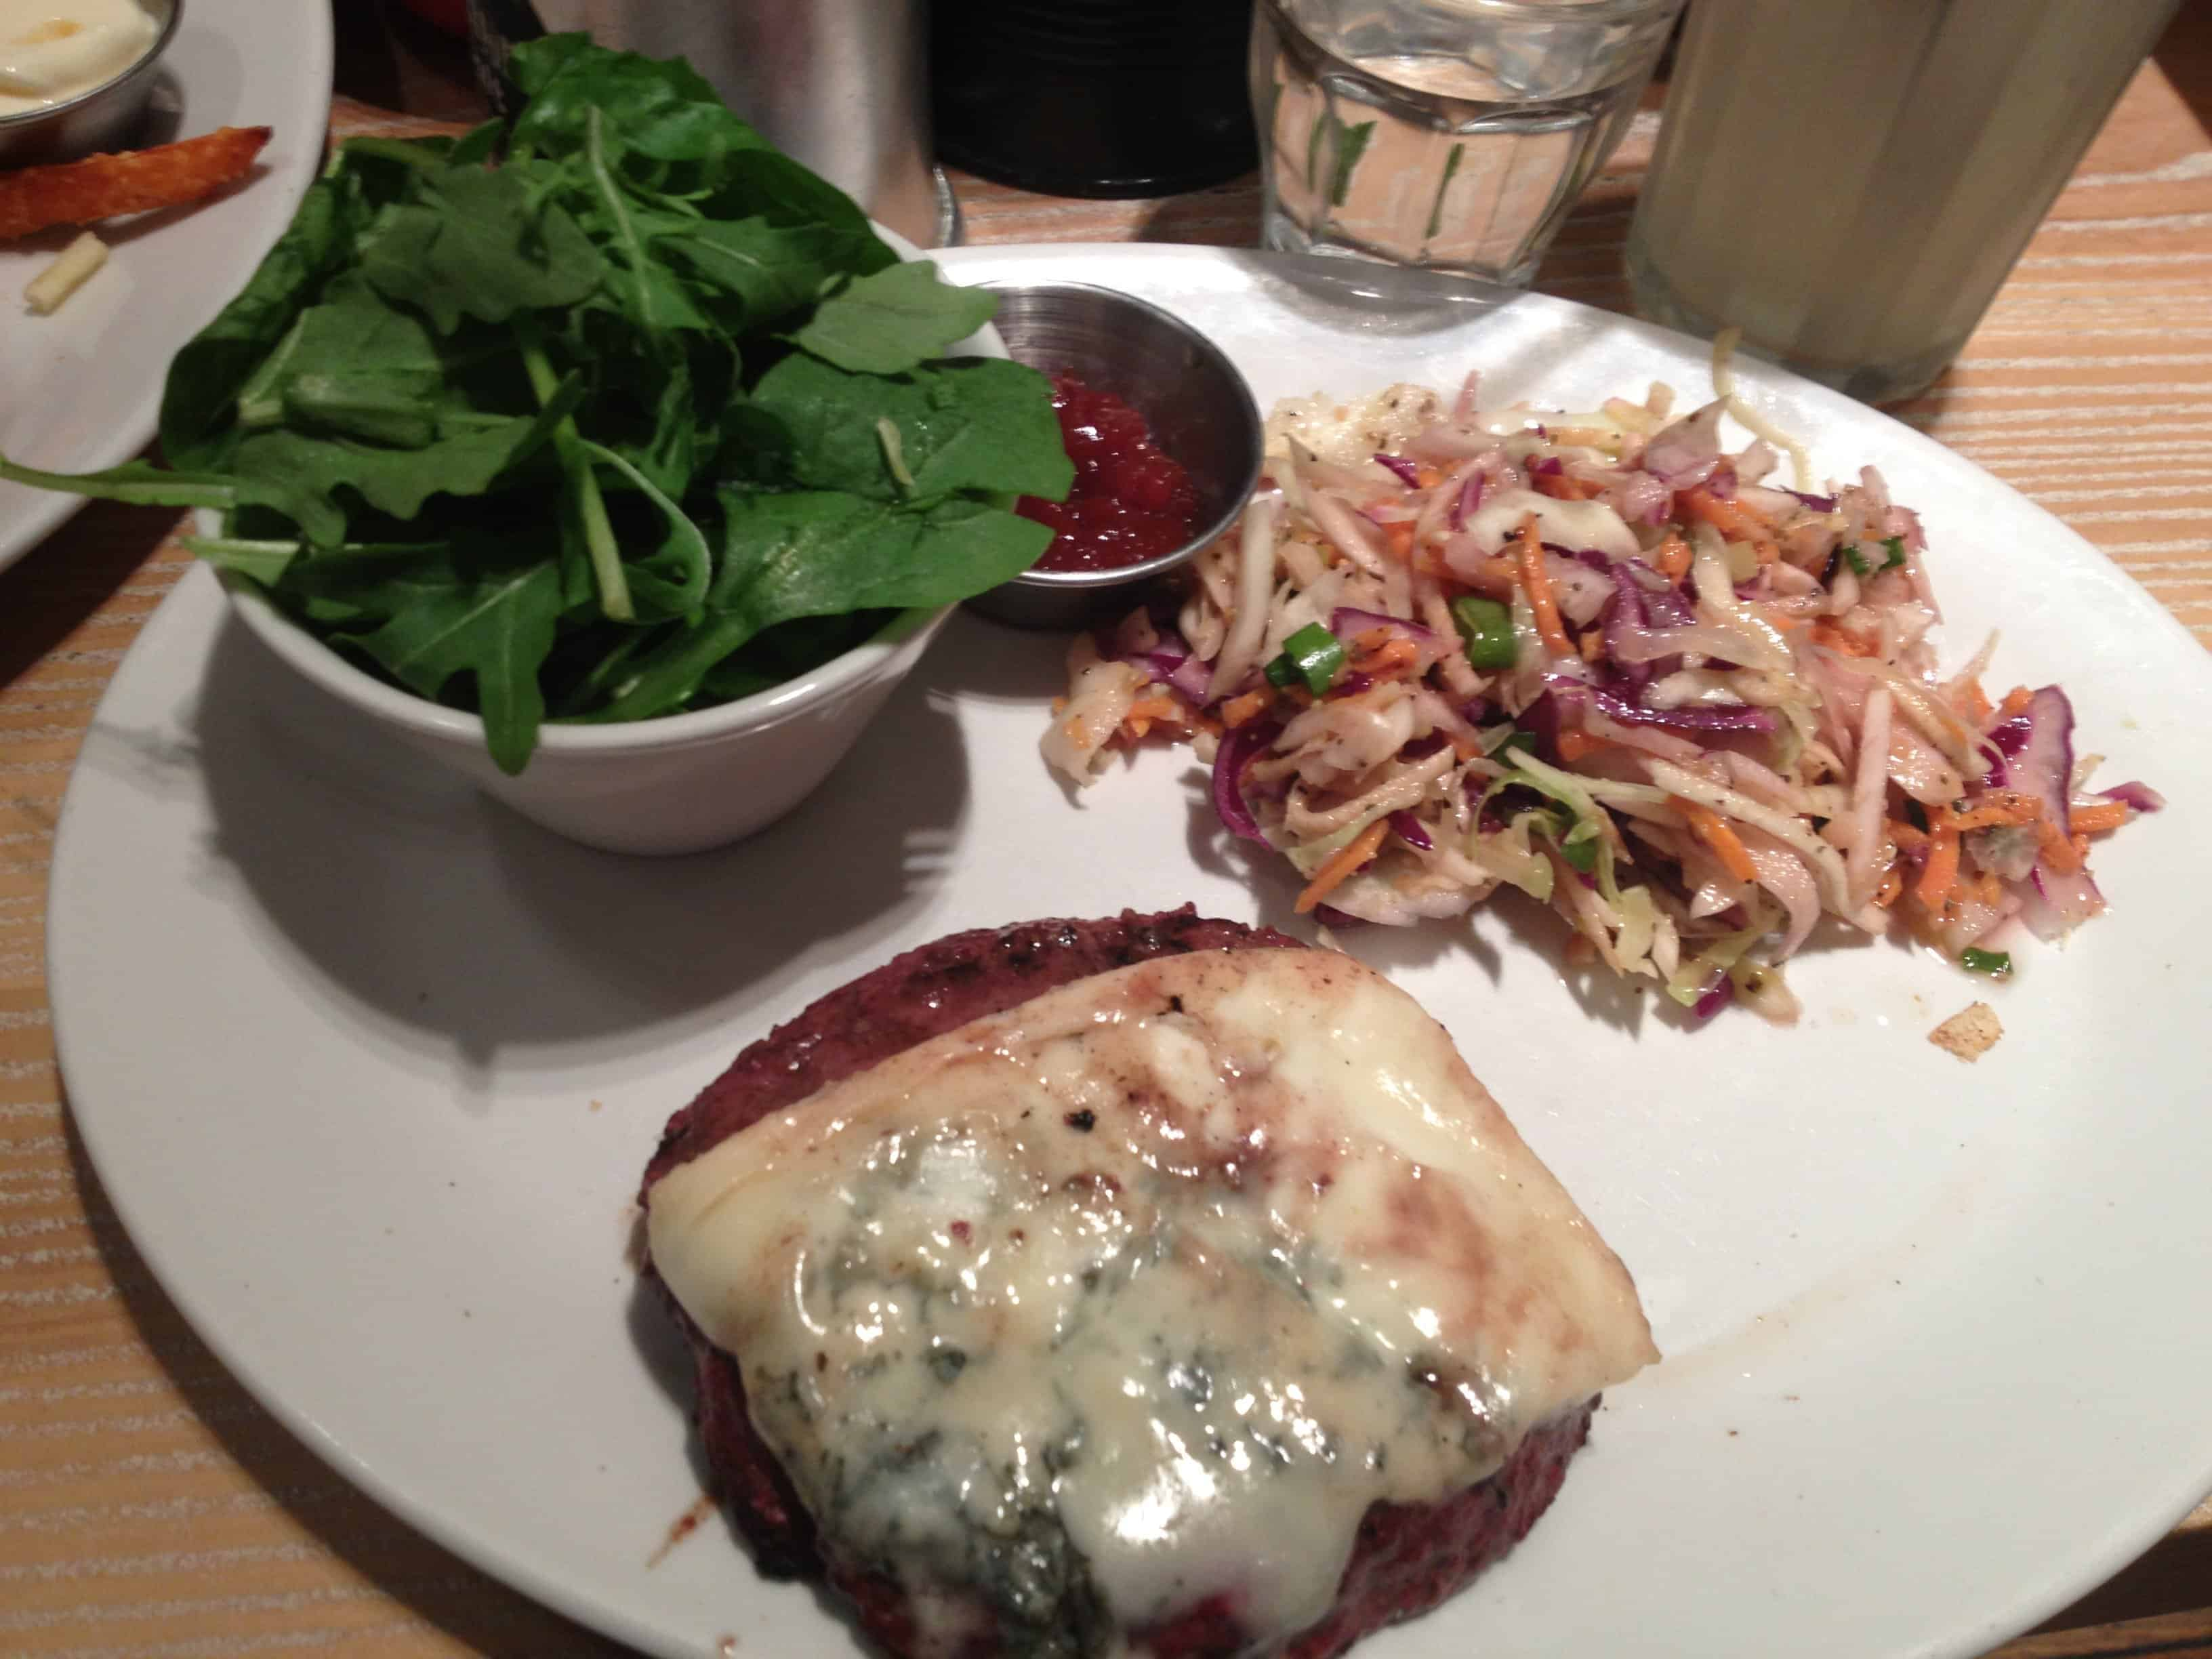 My 'naked' blue cheese burger.